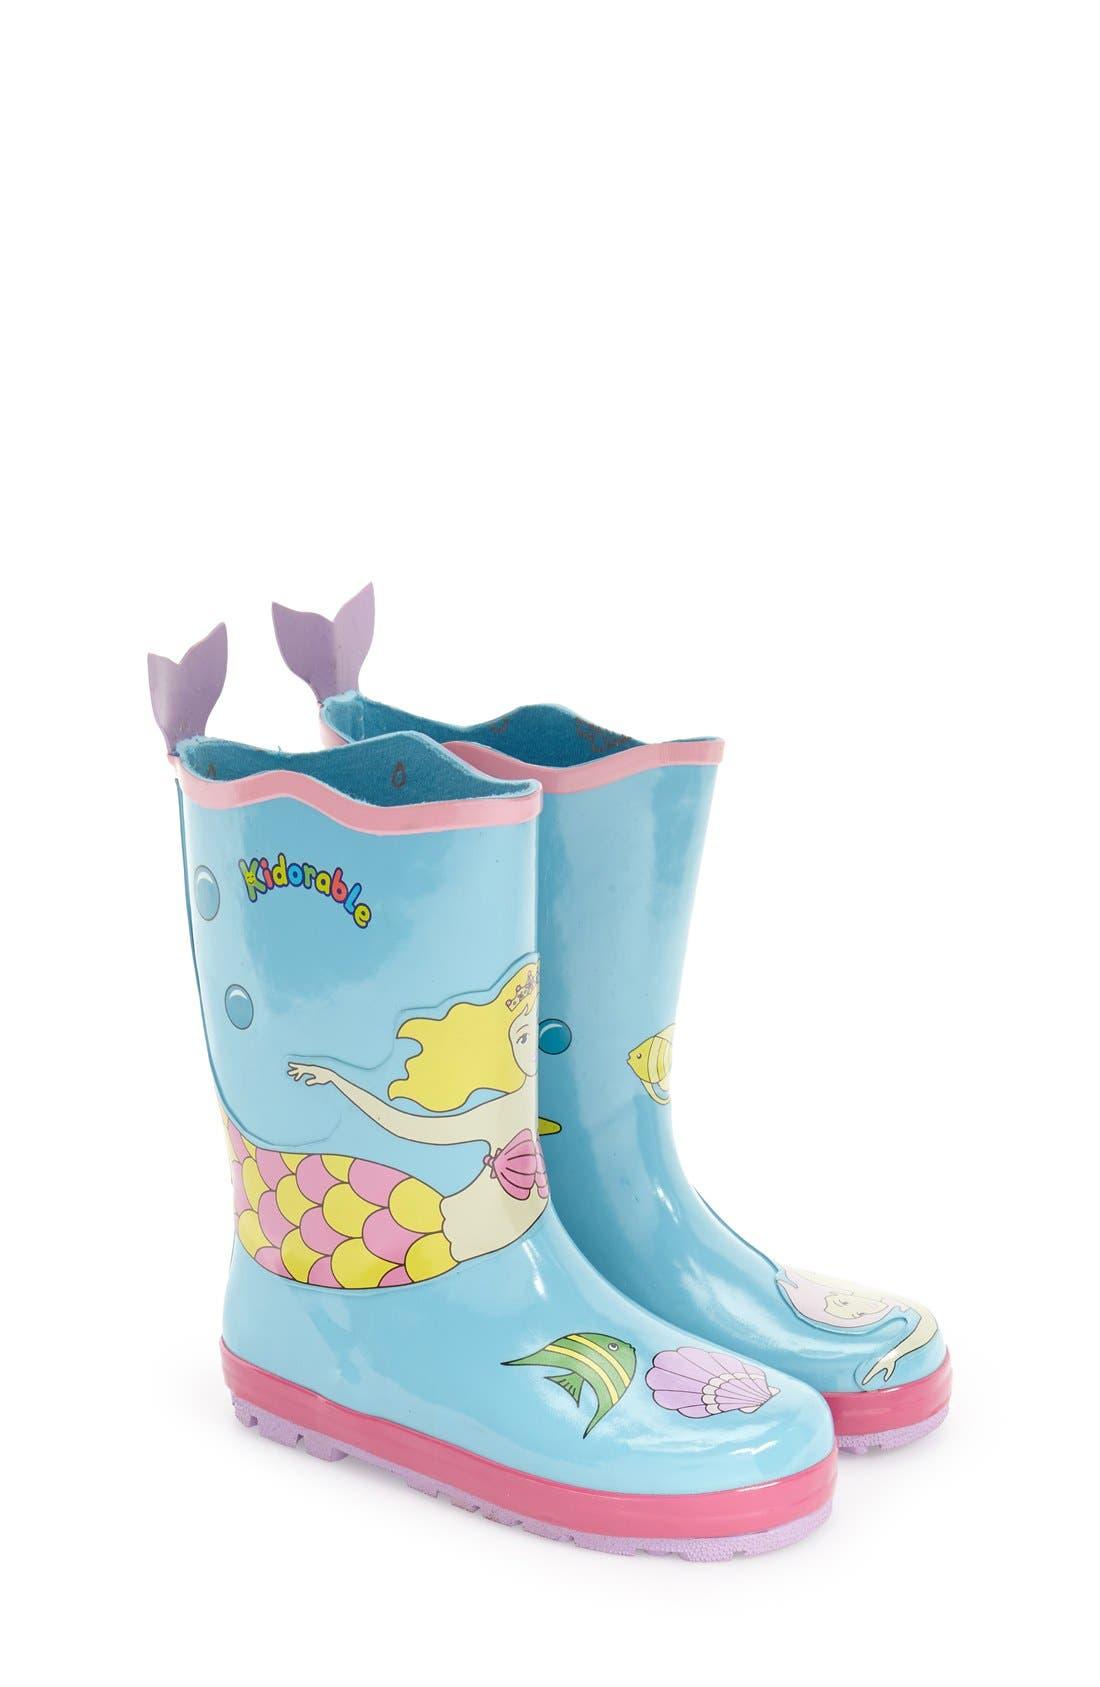 'Mermaid' Waterproof Rain Boot,                         Main,                         color, Blue